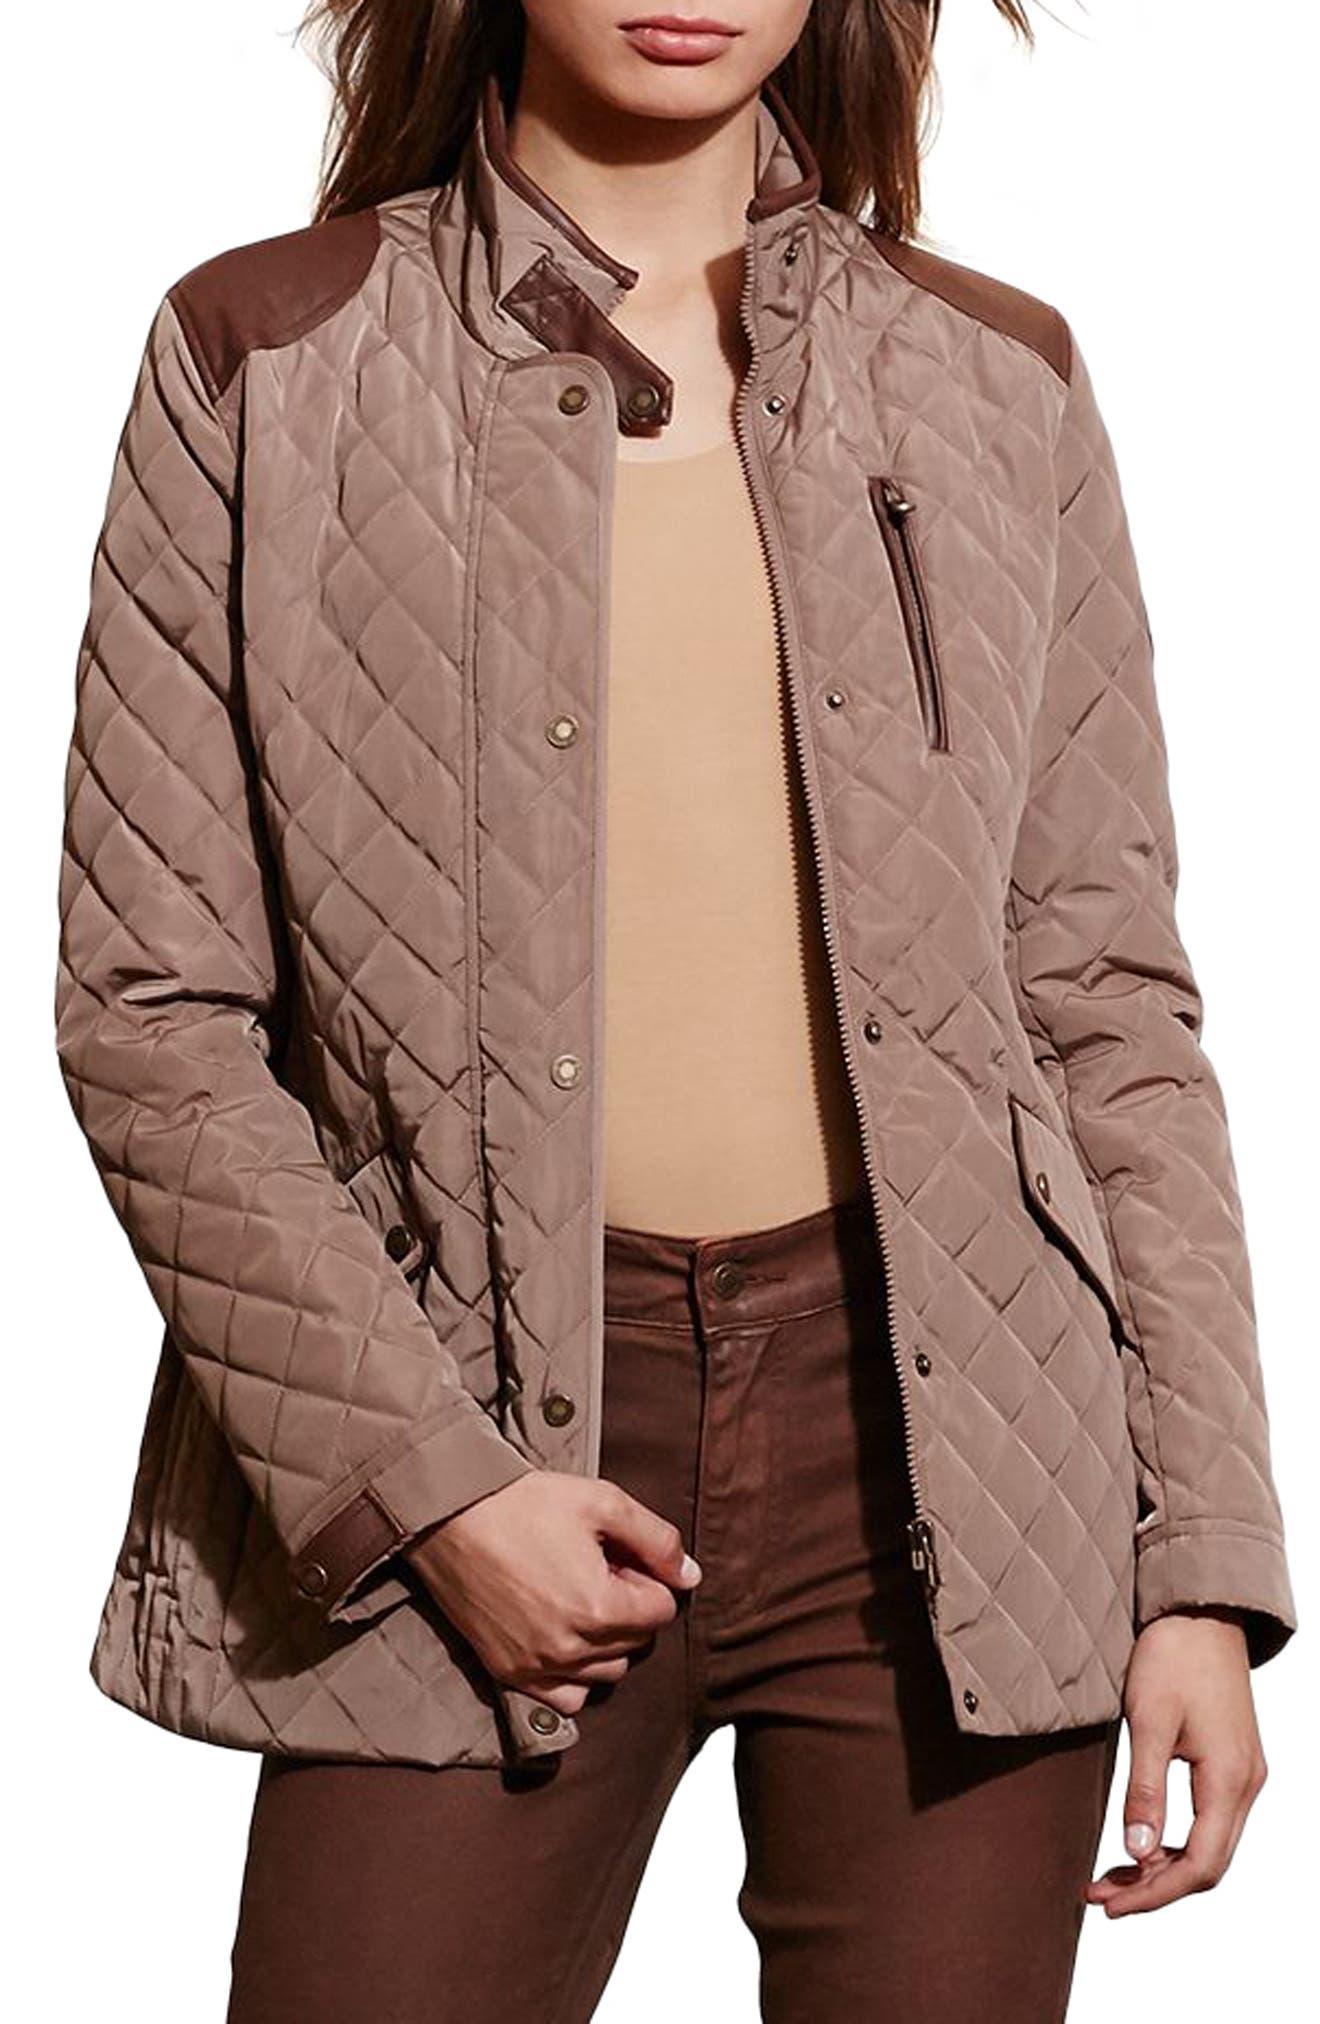 LAUREN RALPH LAUREN Diamond Quilted Jacket with Faux Leather Trim, Main, color, 246